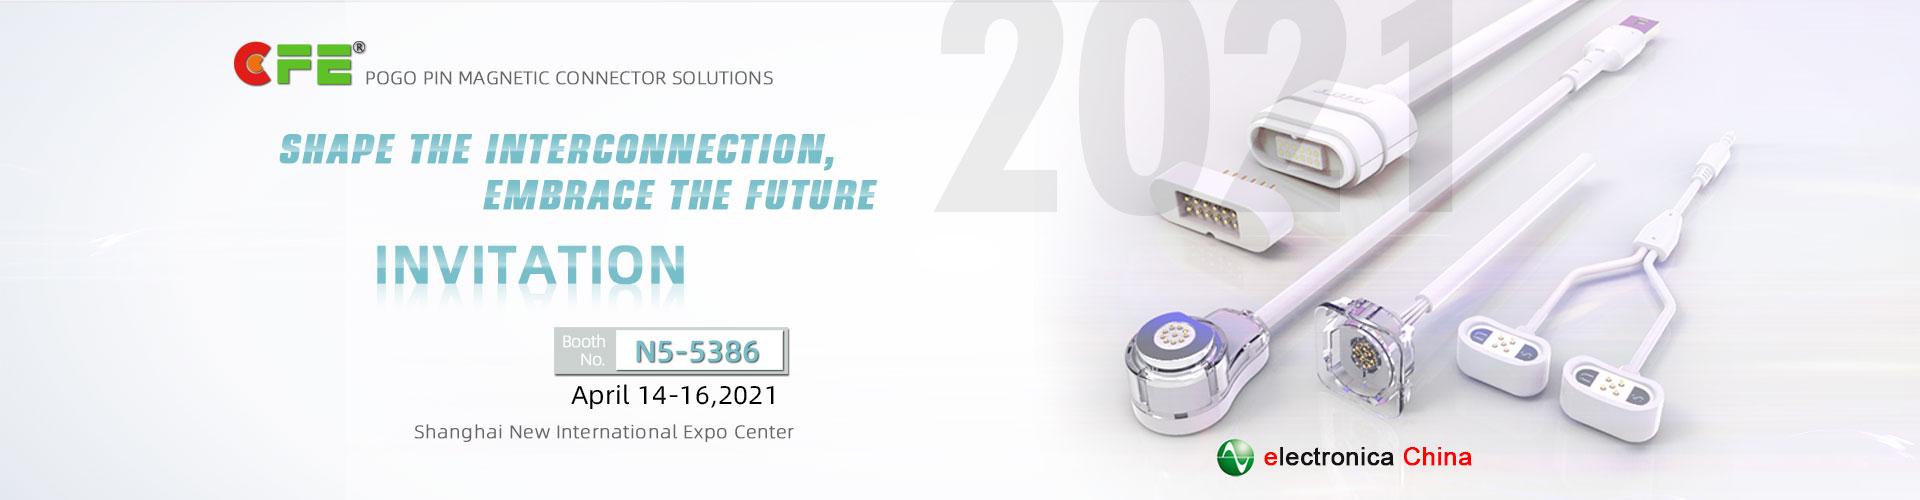 CFE POGO PIN -electronica China